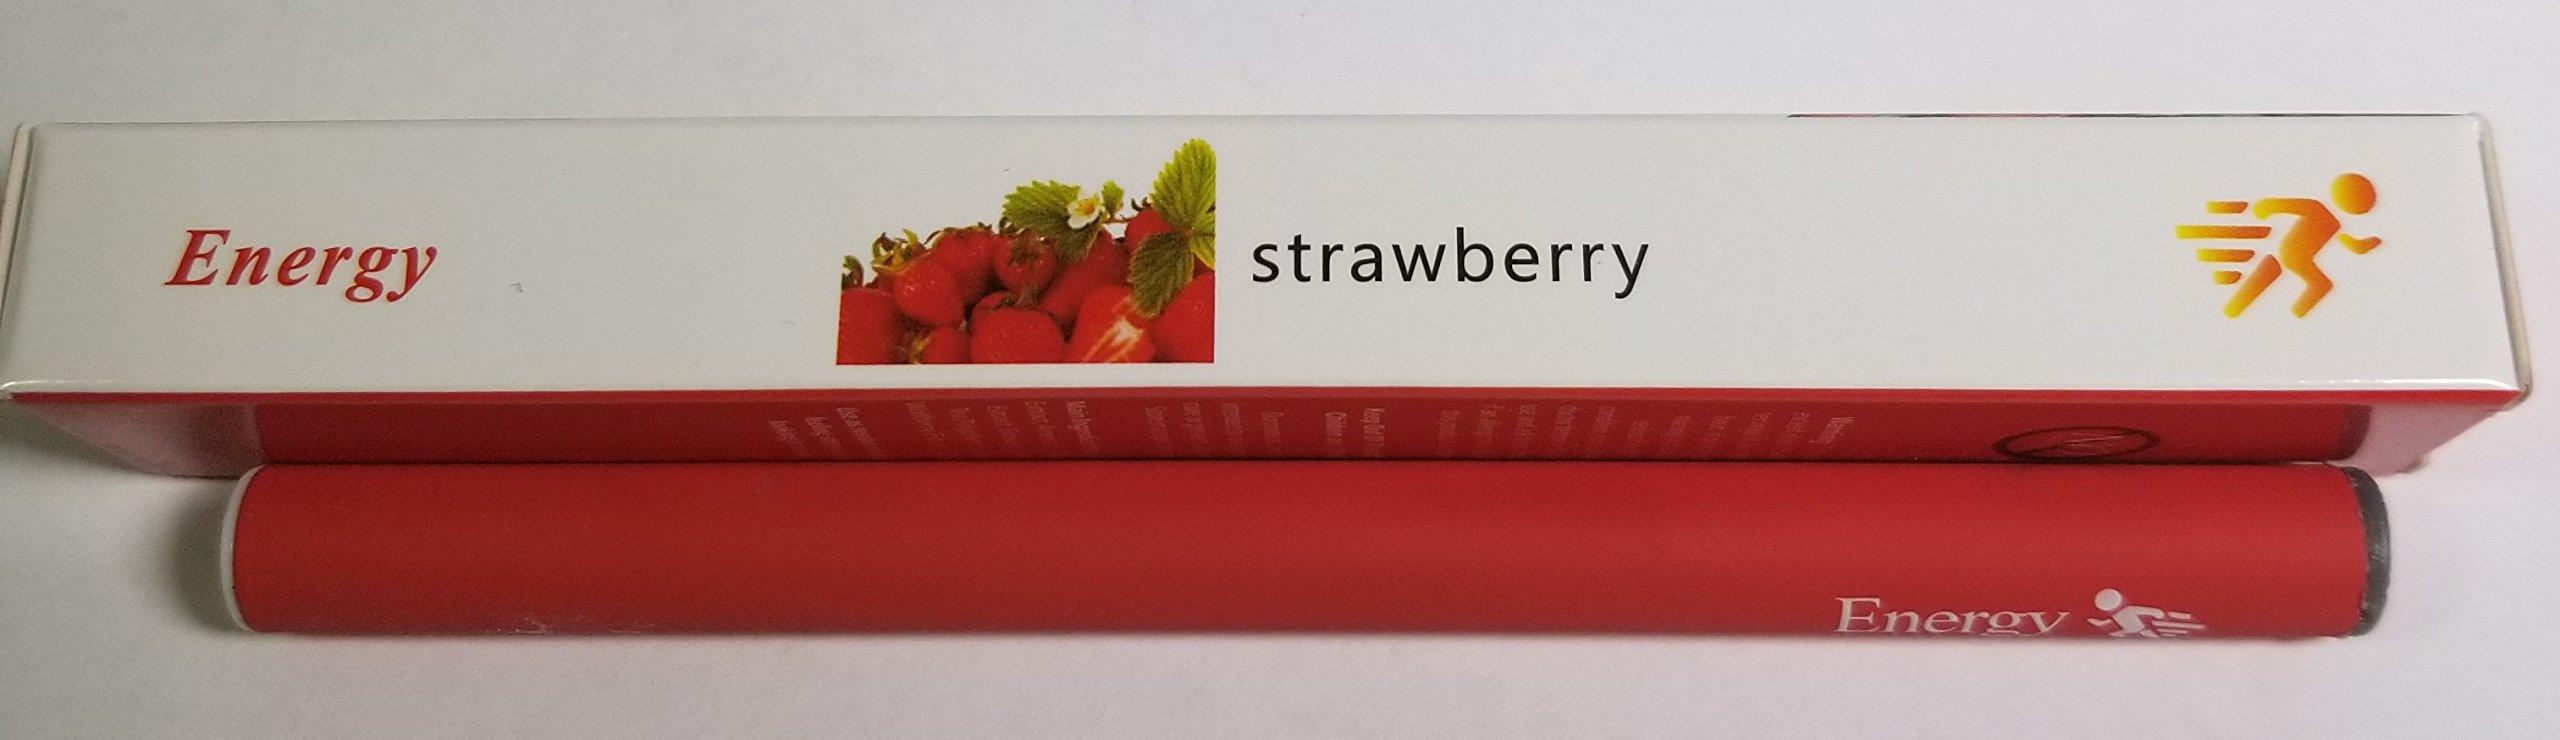 Natural Energy Inhaler ~ Fruity Vitamin Blend, caffeine, ginseng, licorice, tea polyphenol, wolfberry extract ~ Enhance Mood, Breathe Bliss ~ 500 puff *no nicotine! (Strawberry)